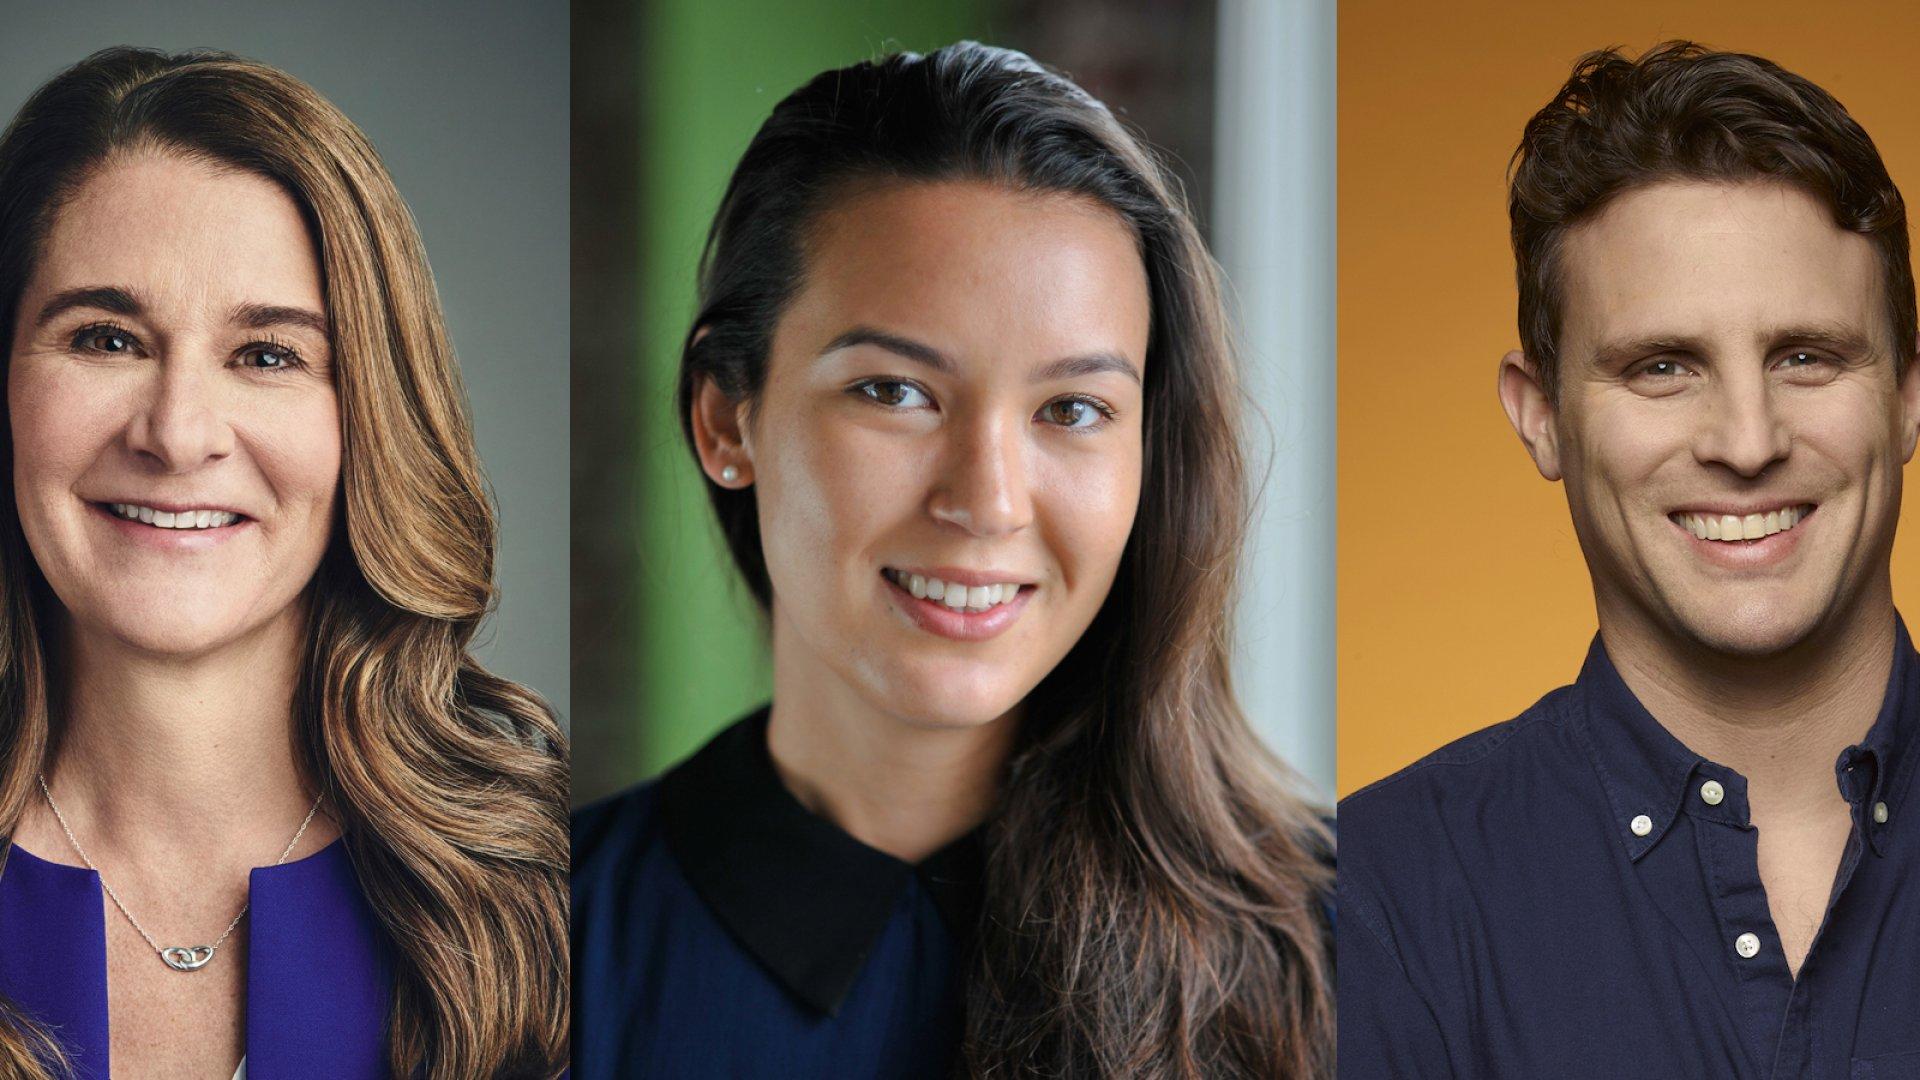 From left: Melinda Gates, Laura Behrens Wu, Michael Dubin.